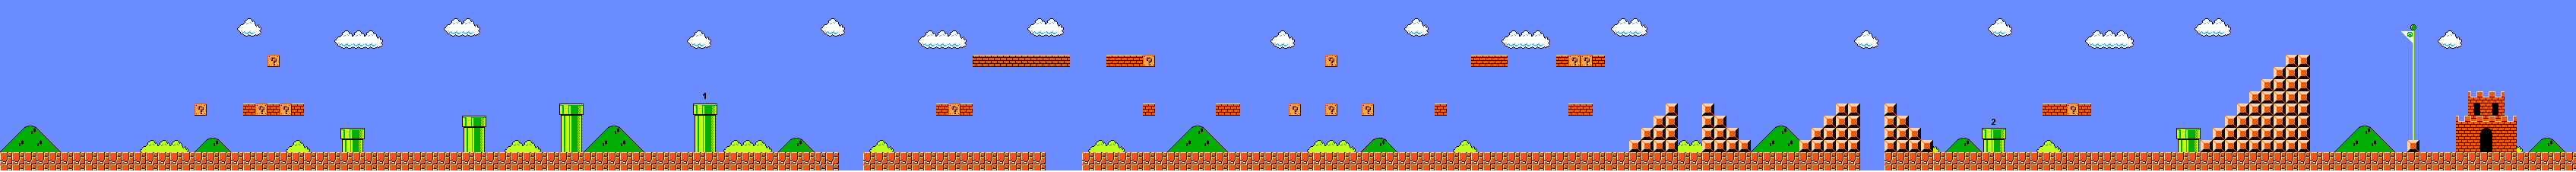 Mario World 1-1 (8-bit)